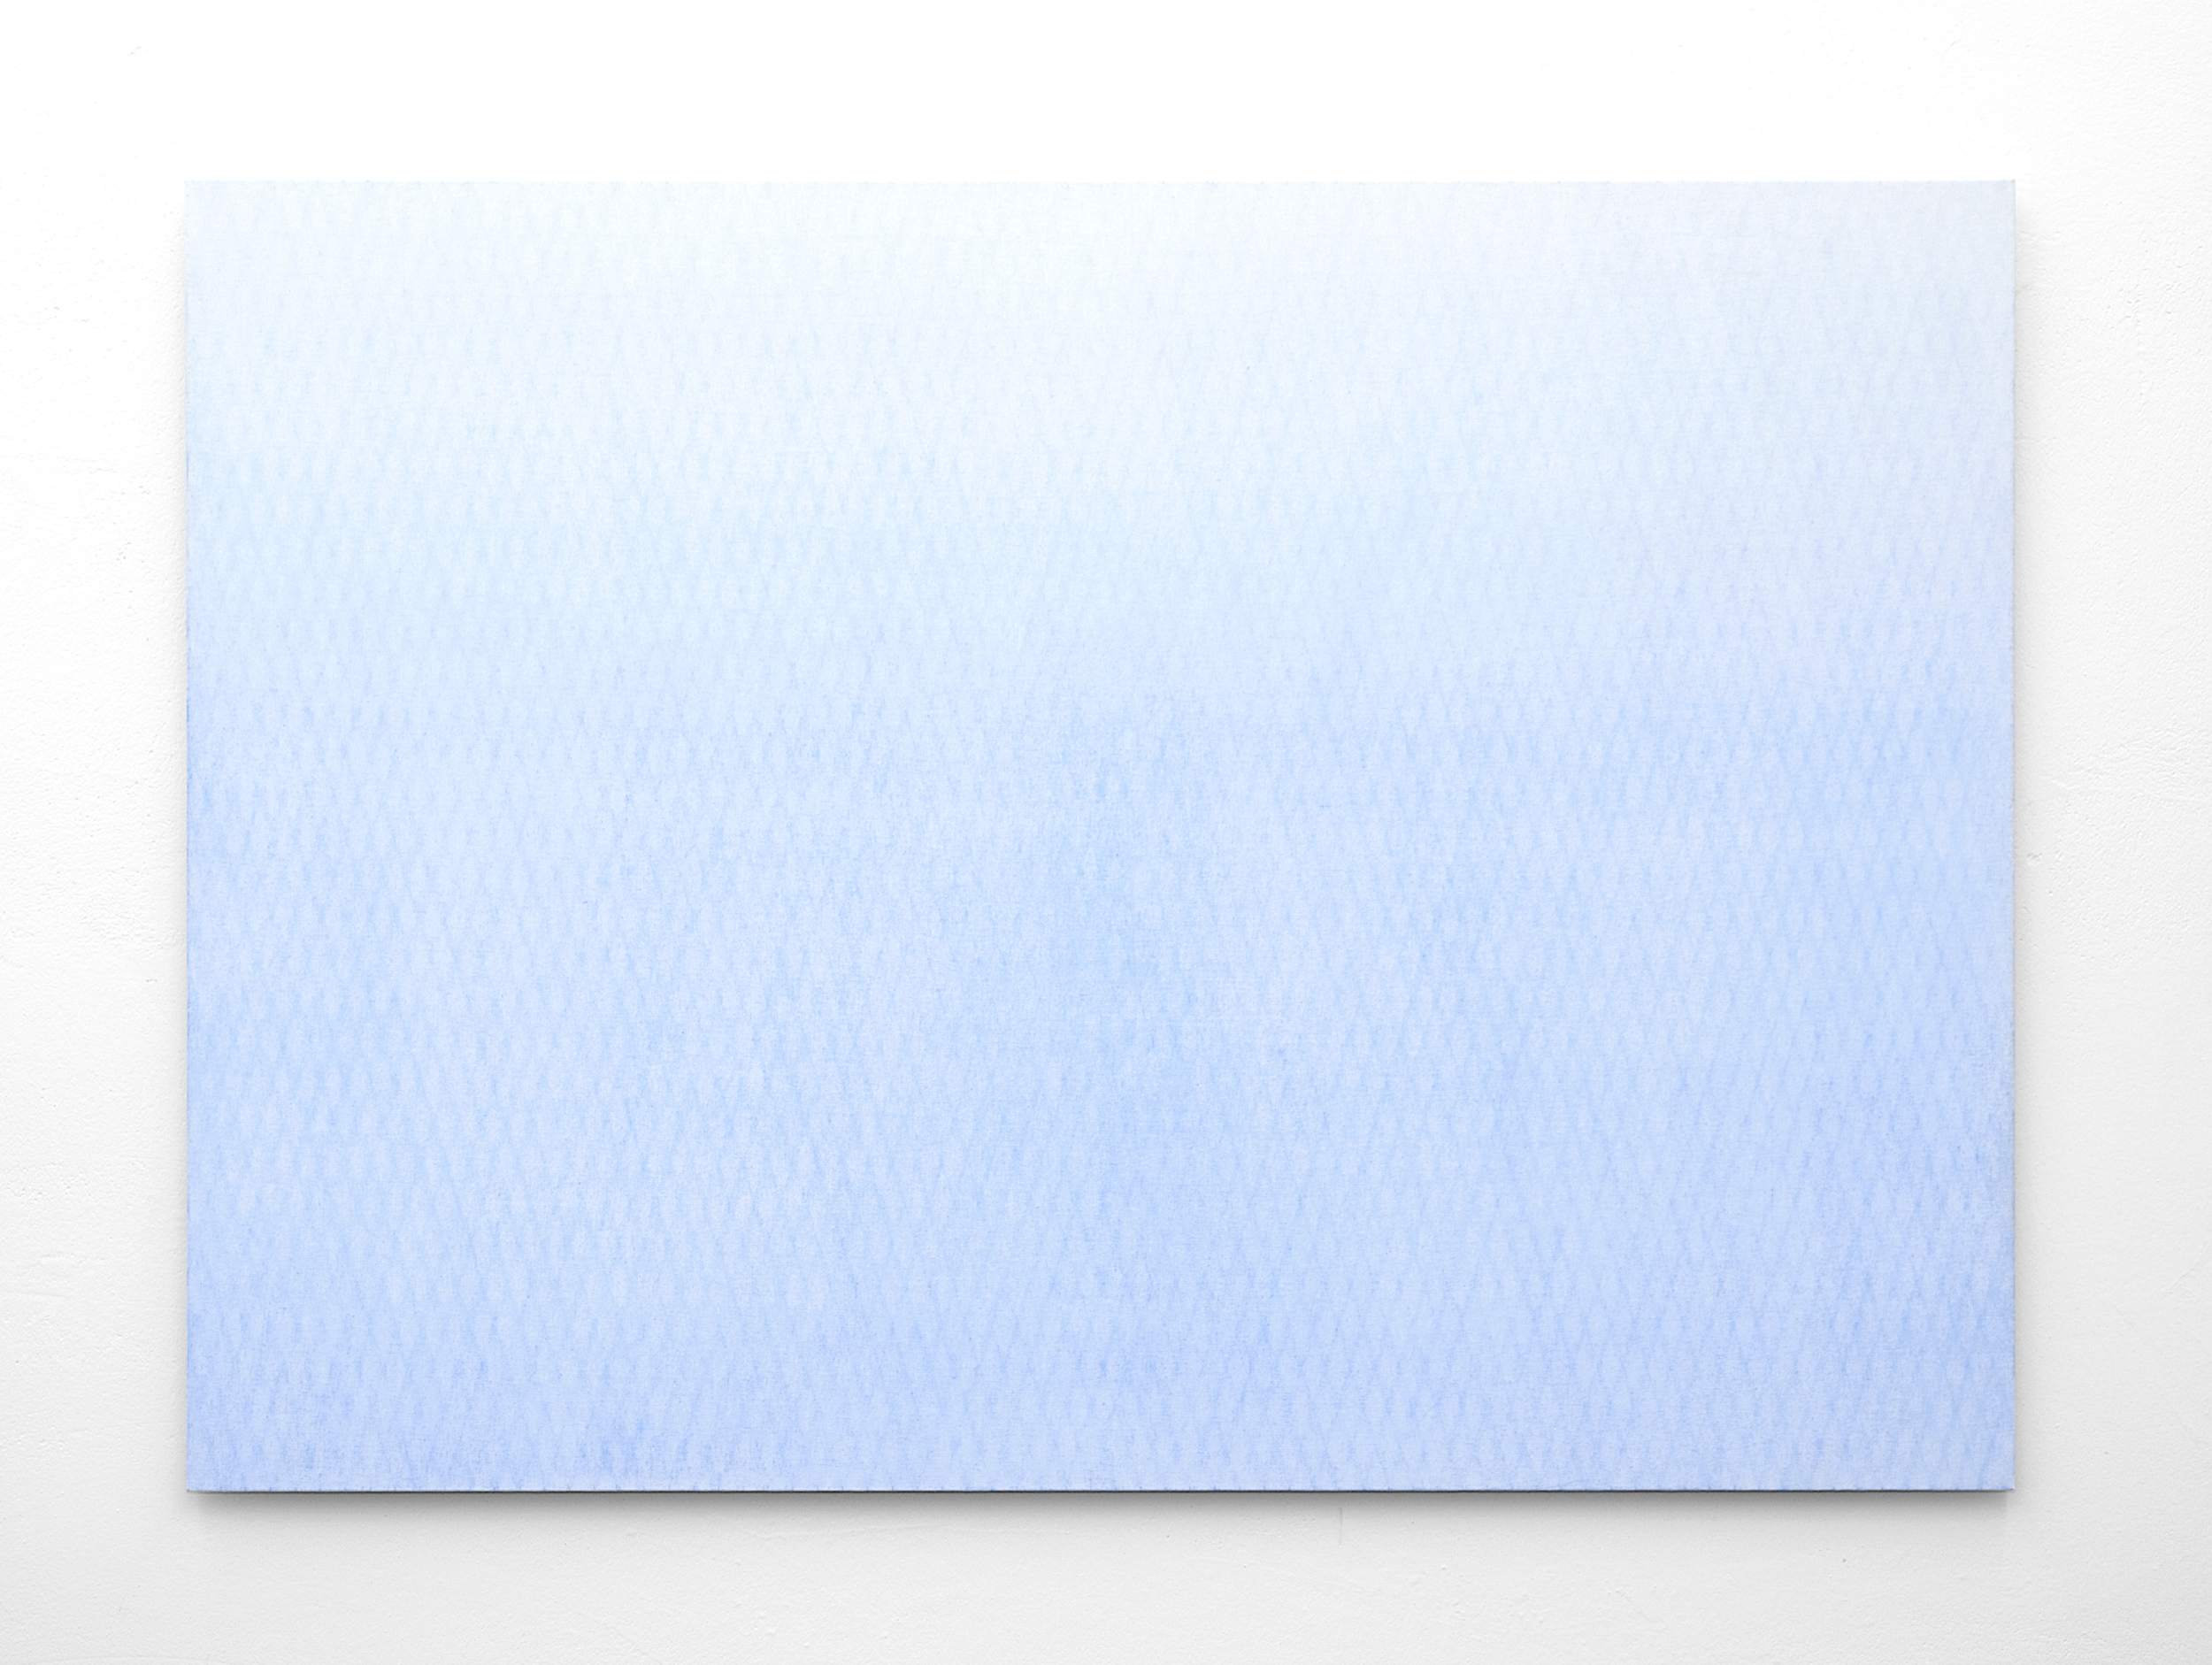 bild nr. 04/2011-100 x 140cm - acryl auf baumwolle/alu